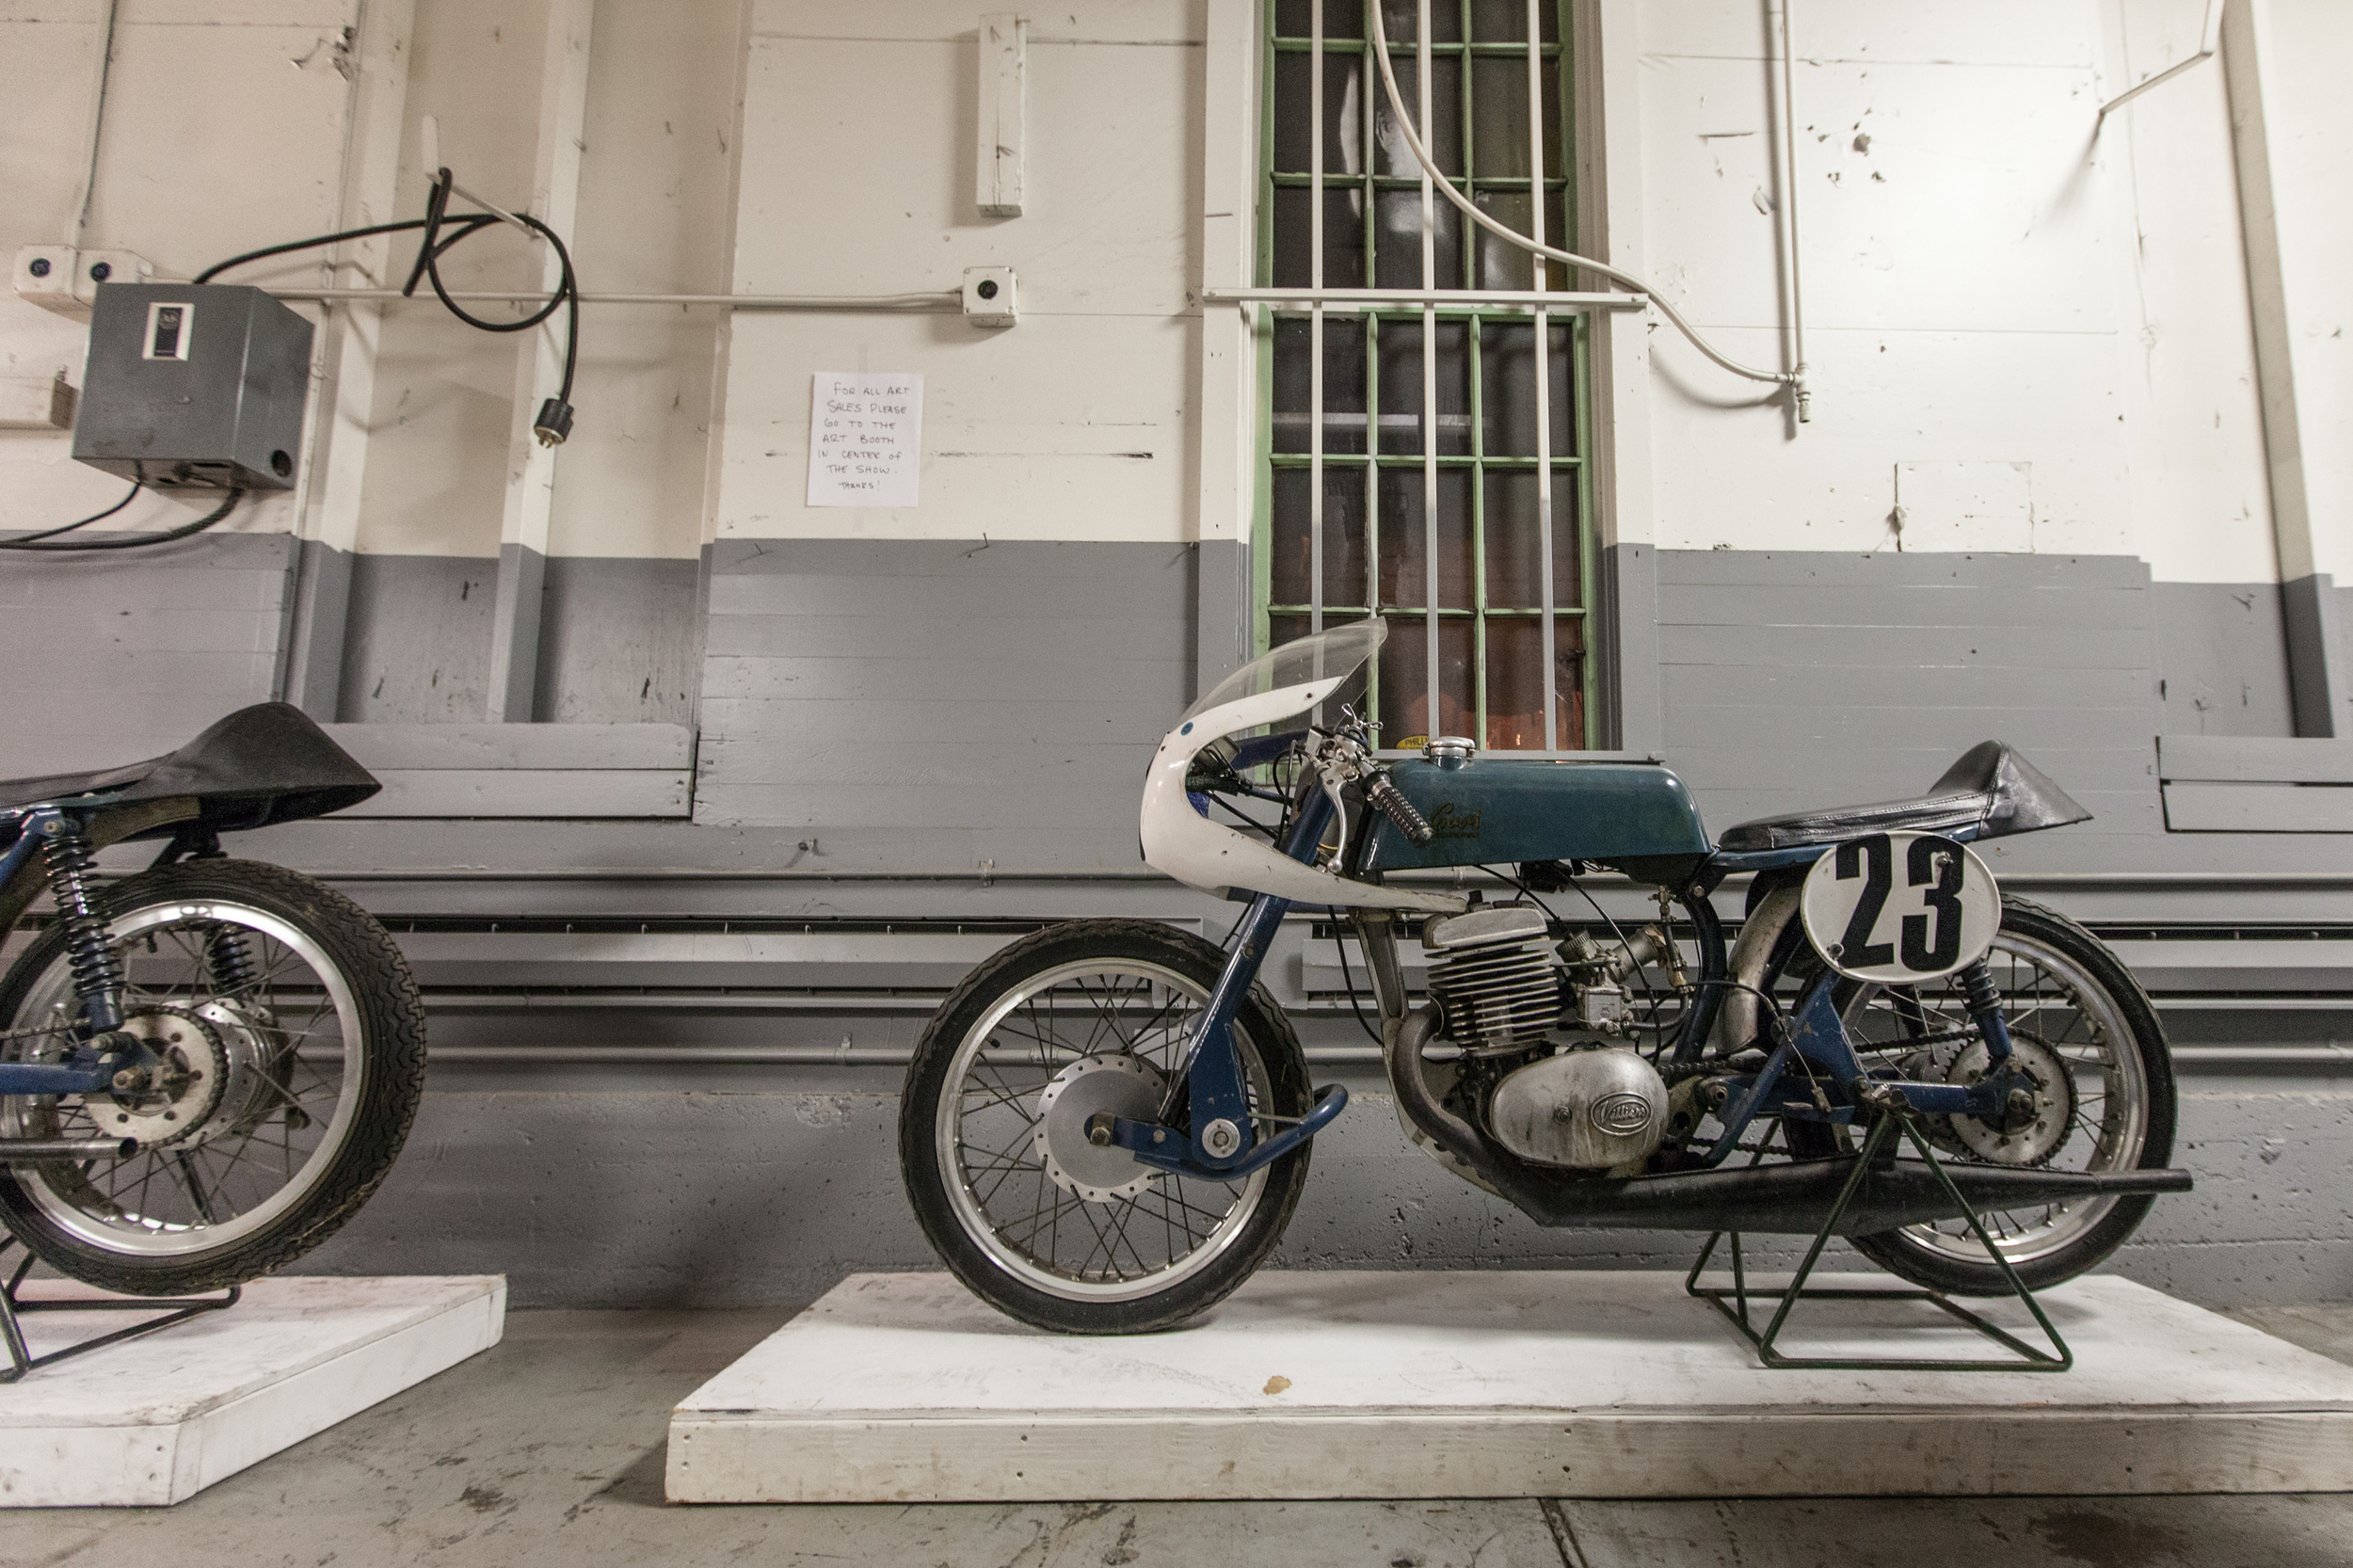 02-14-15 The 1 Moto Show - 1_-76-5.jpg